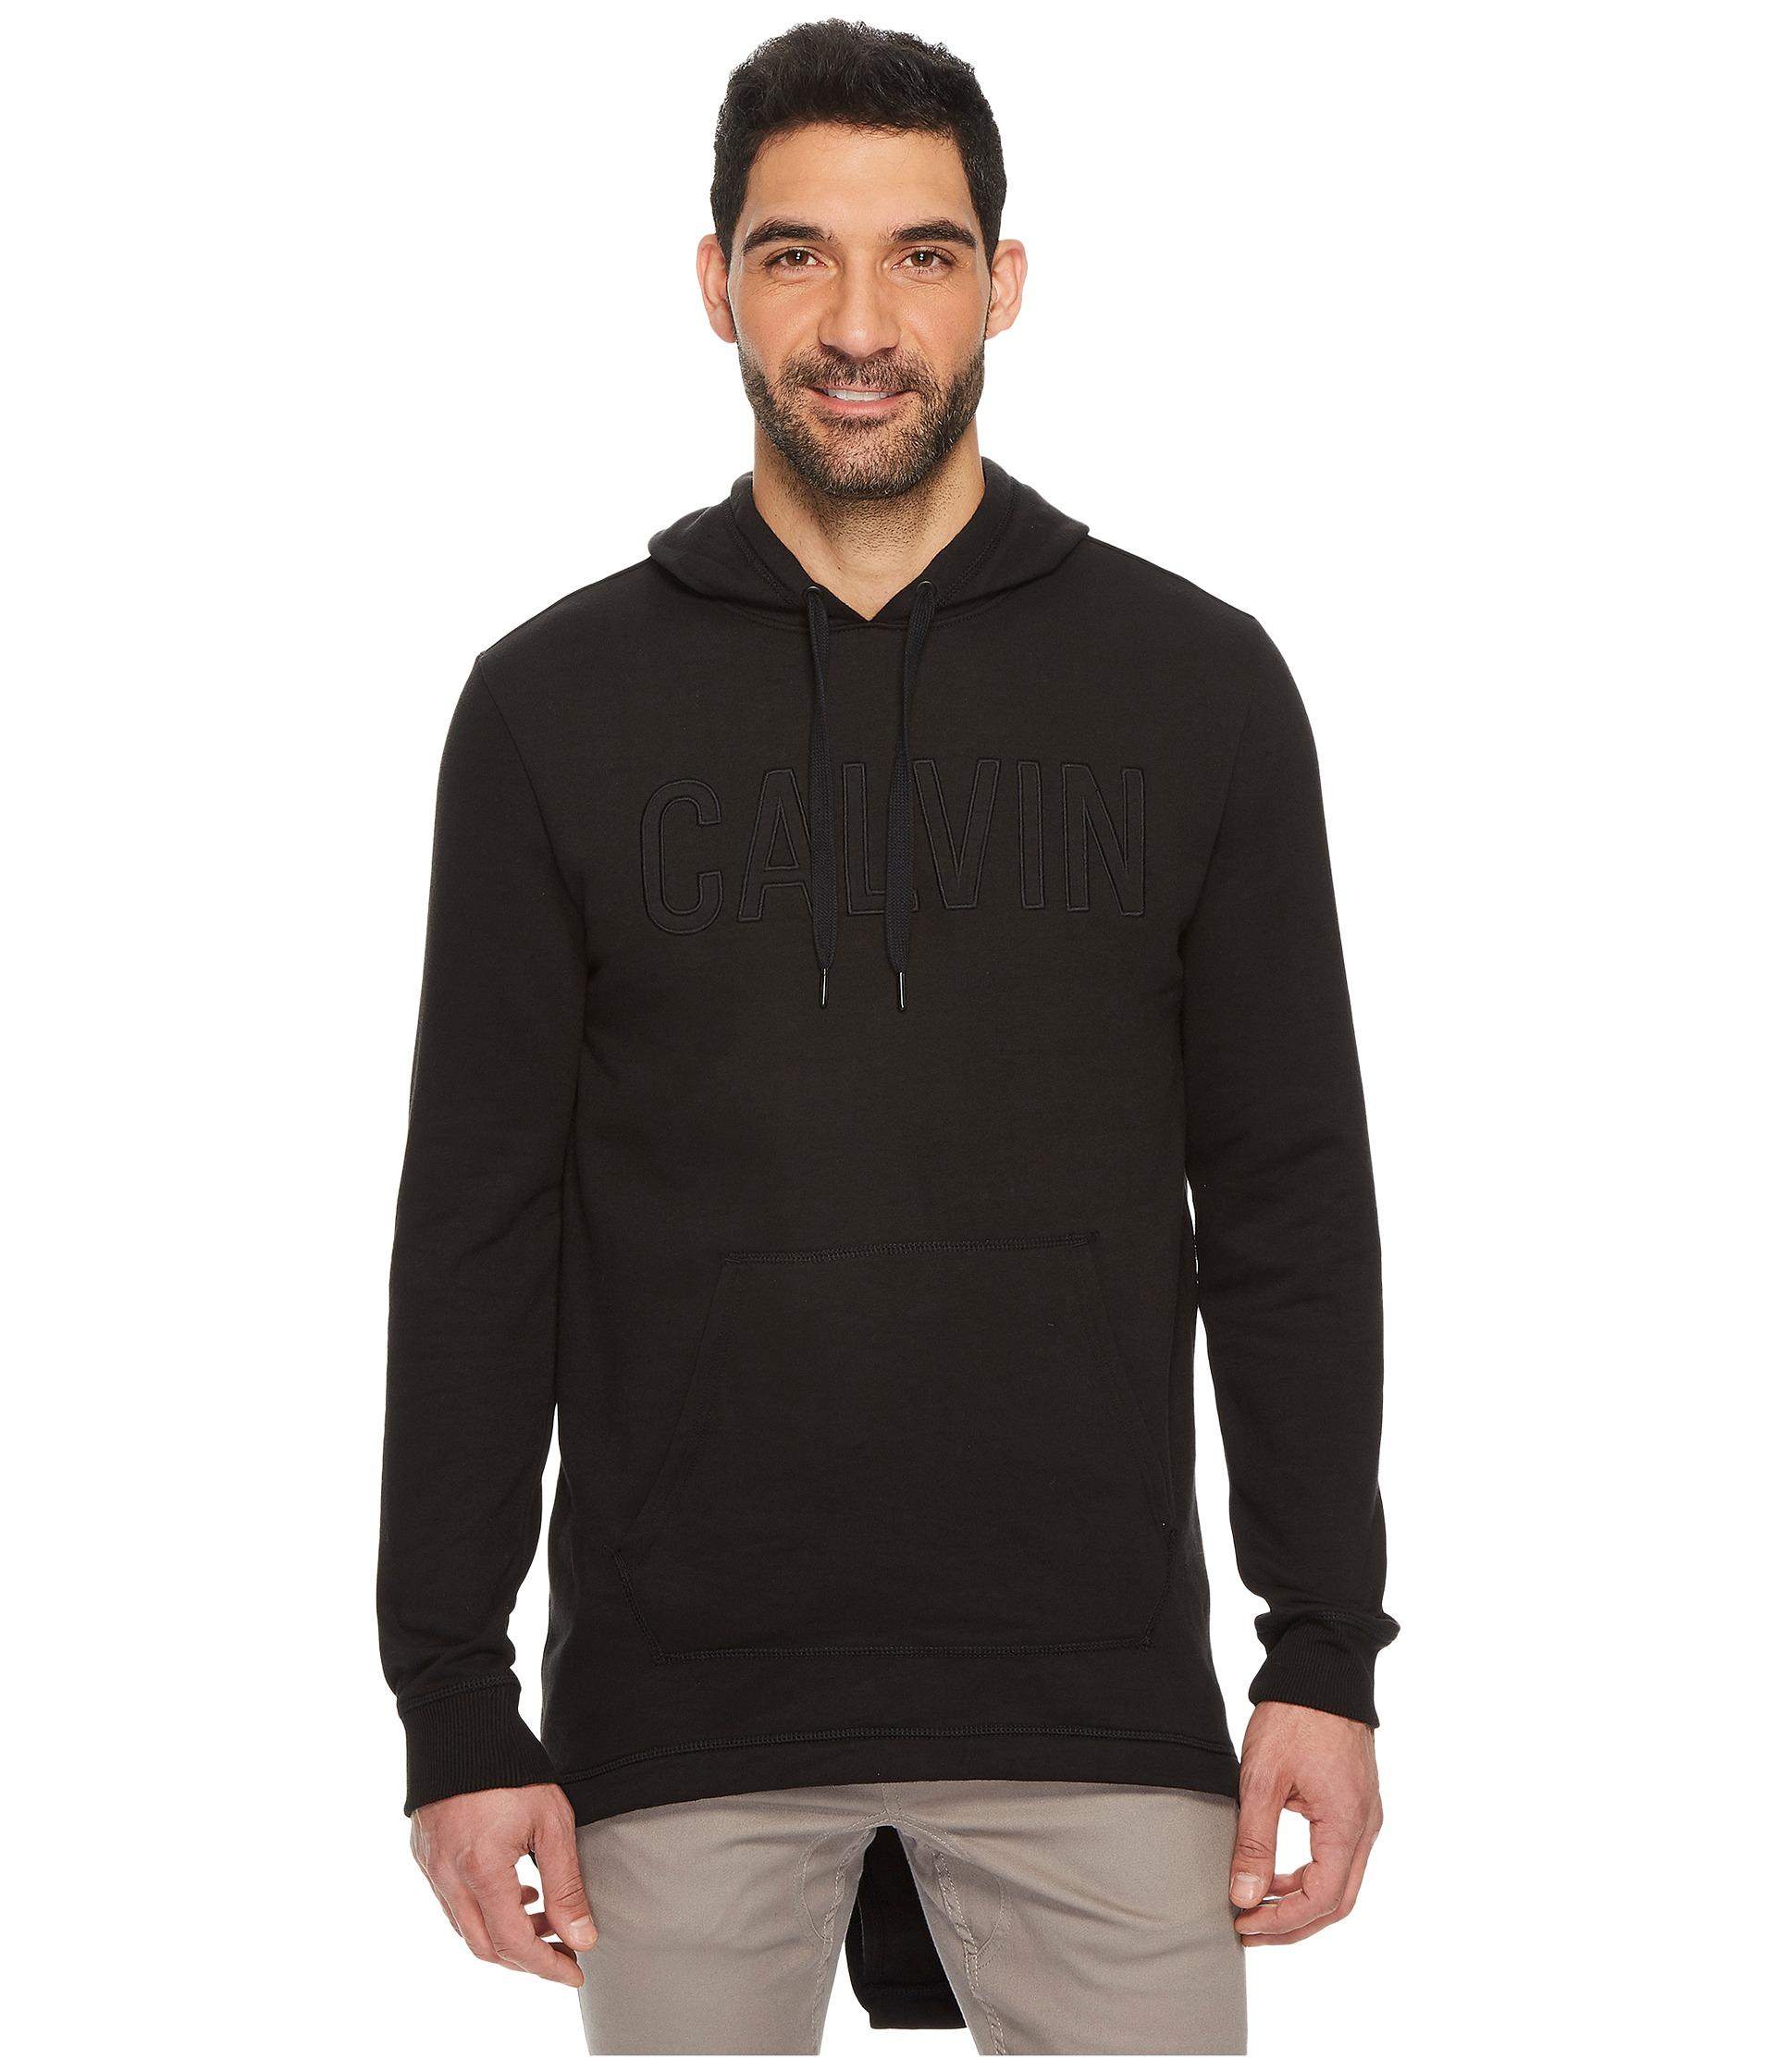 calvin klein jeans fishtail parka hem pullover hoodie at. Black Bedroom Furniture Sets. Home Design Ideas